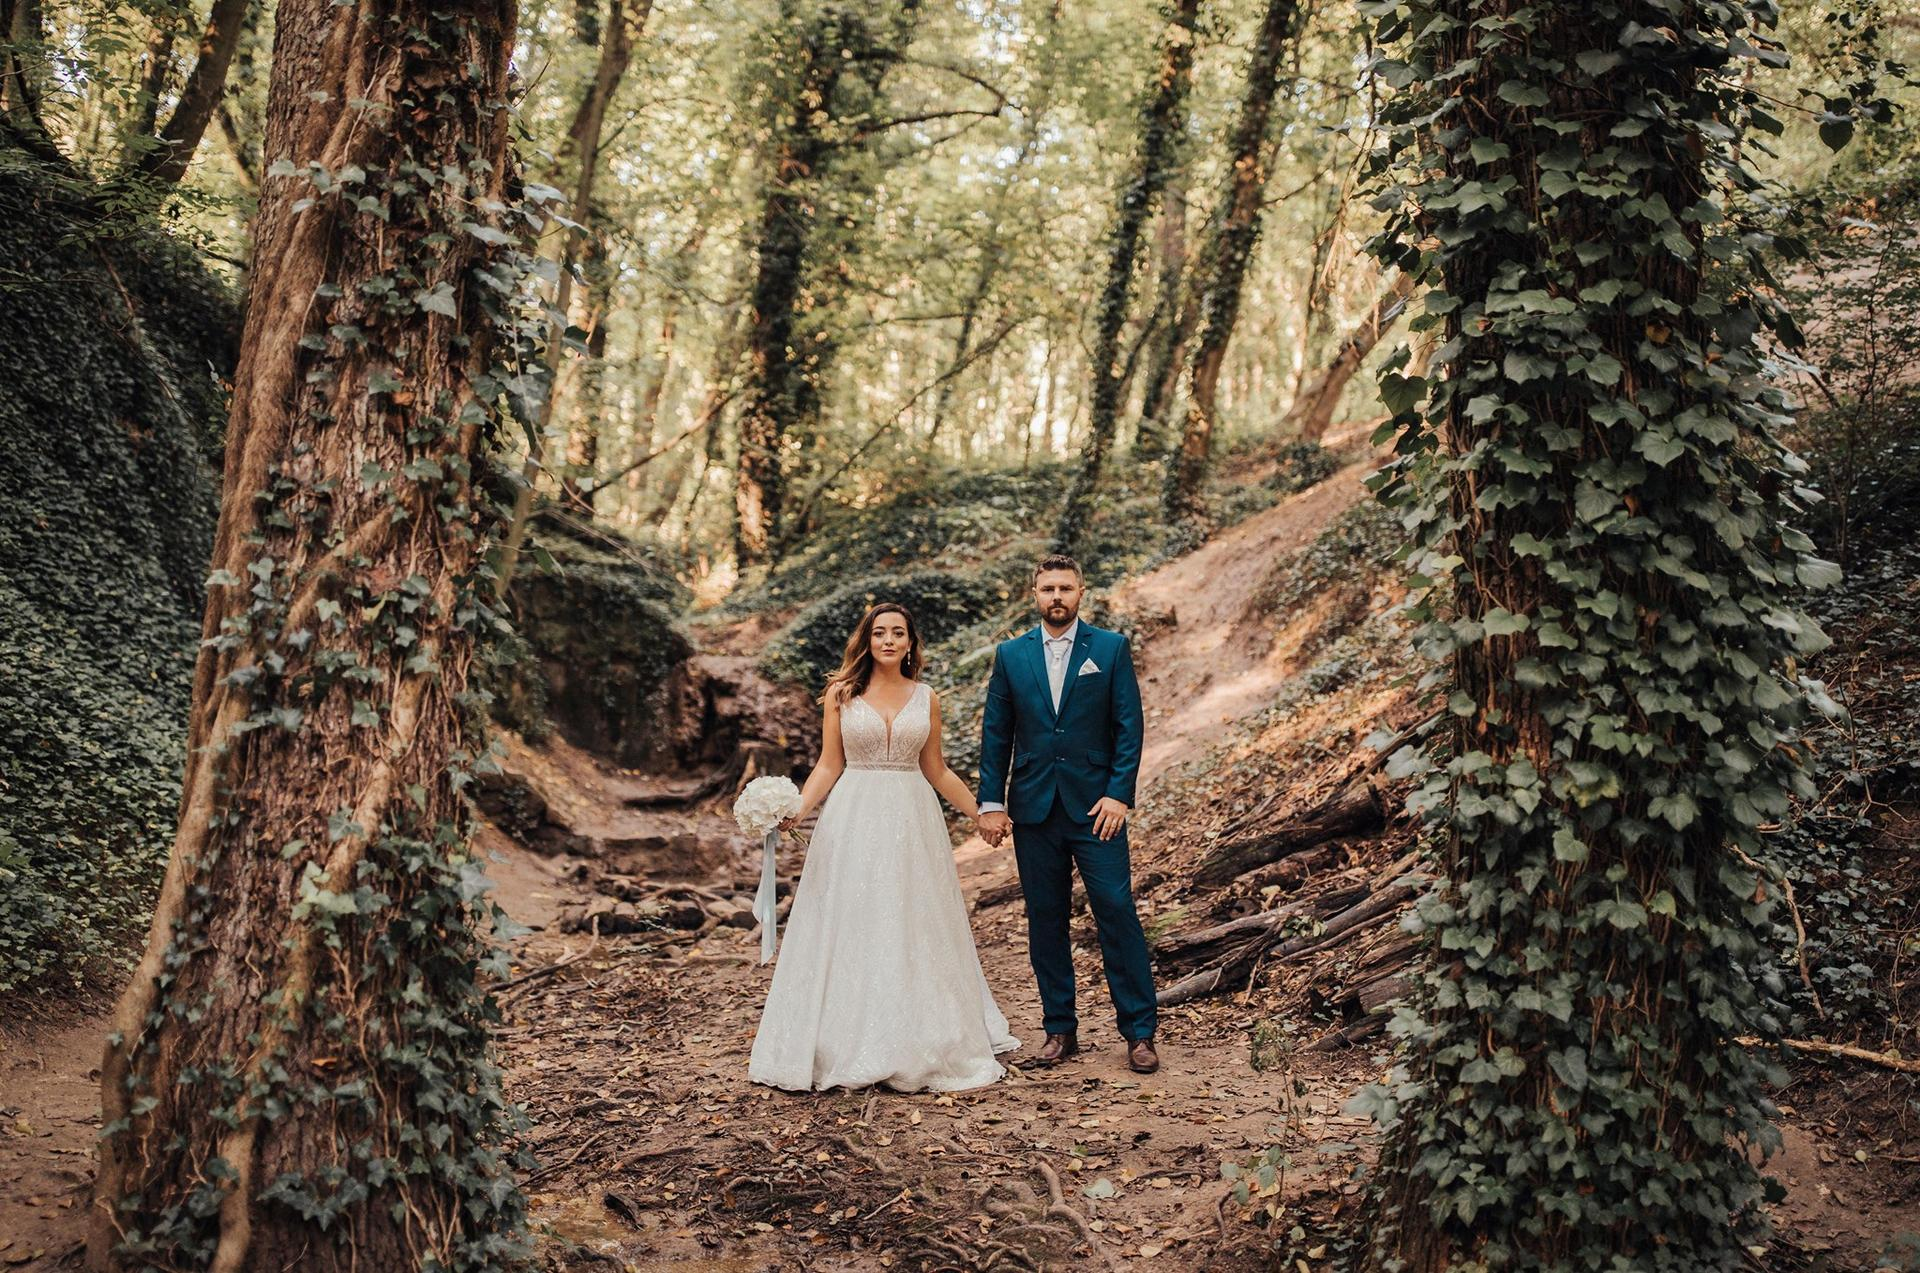 Mr. & Mrs. ❤️ - Obrázok č. 3